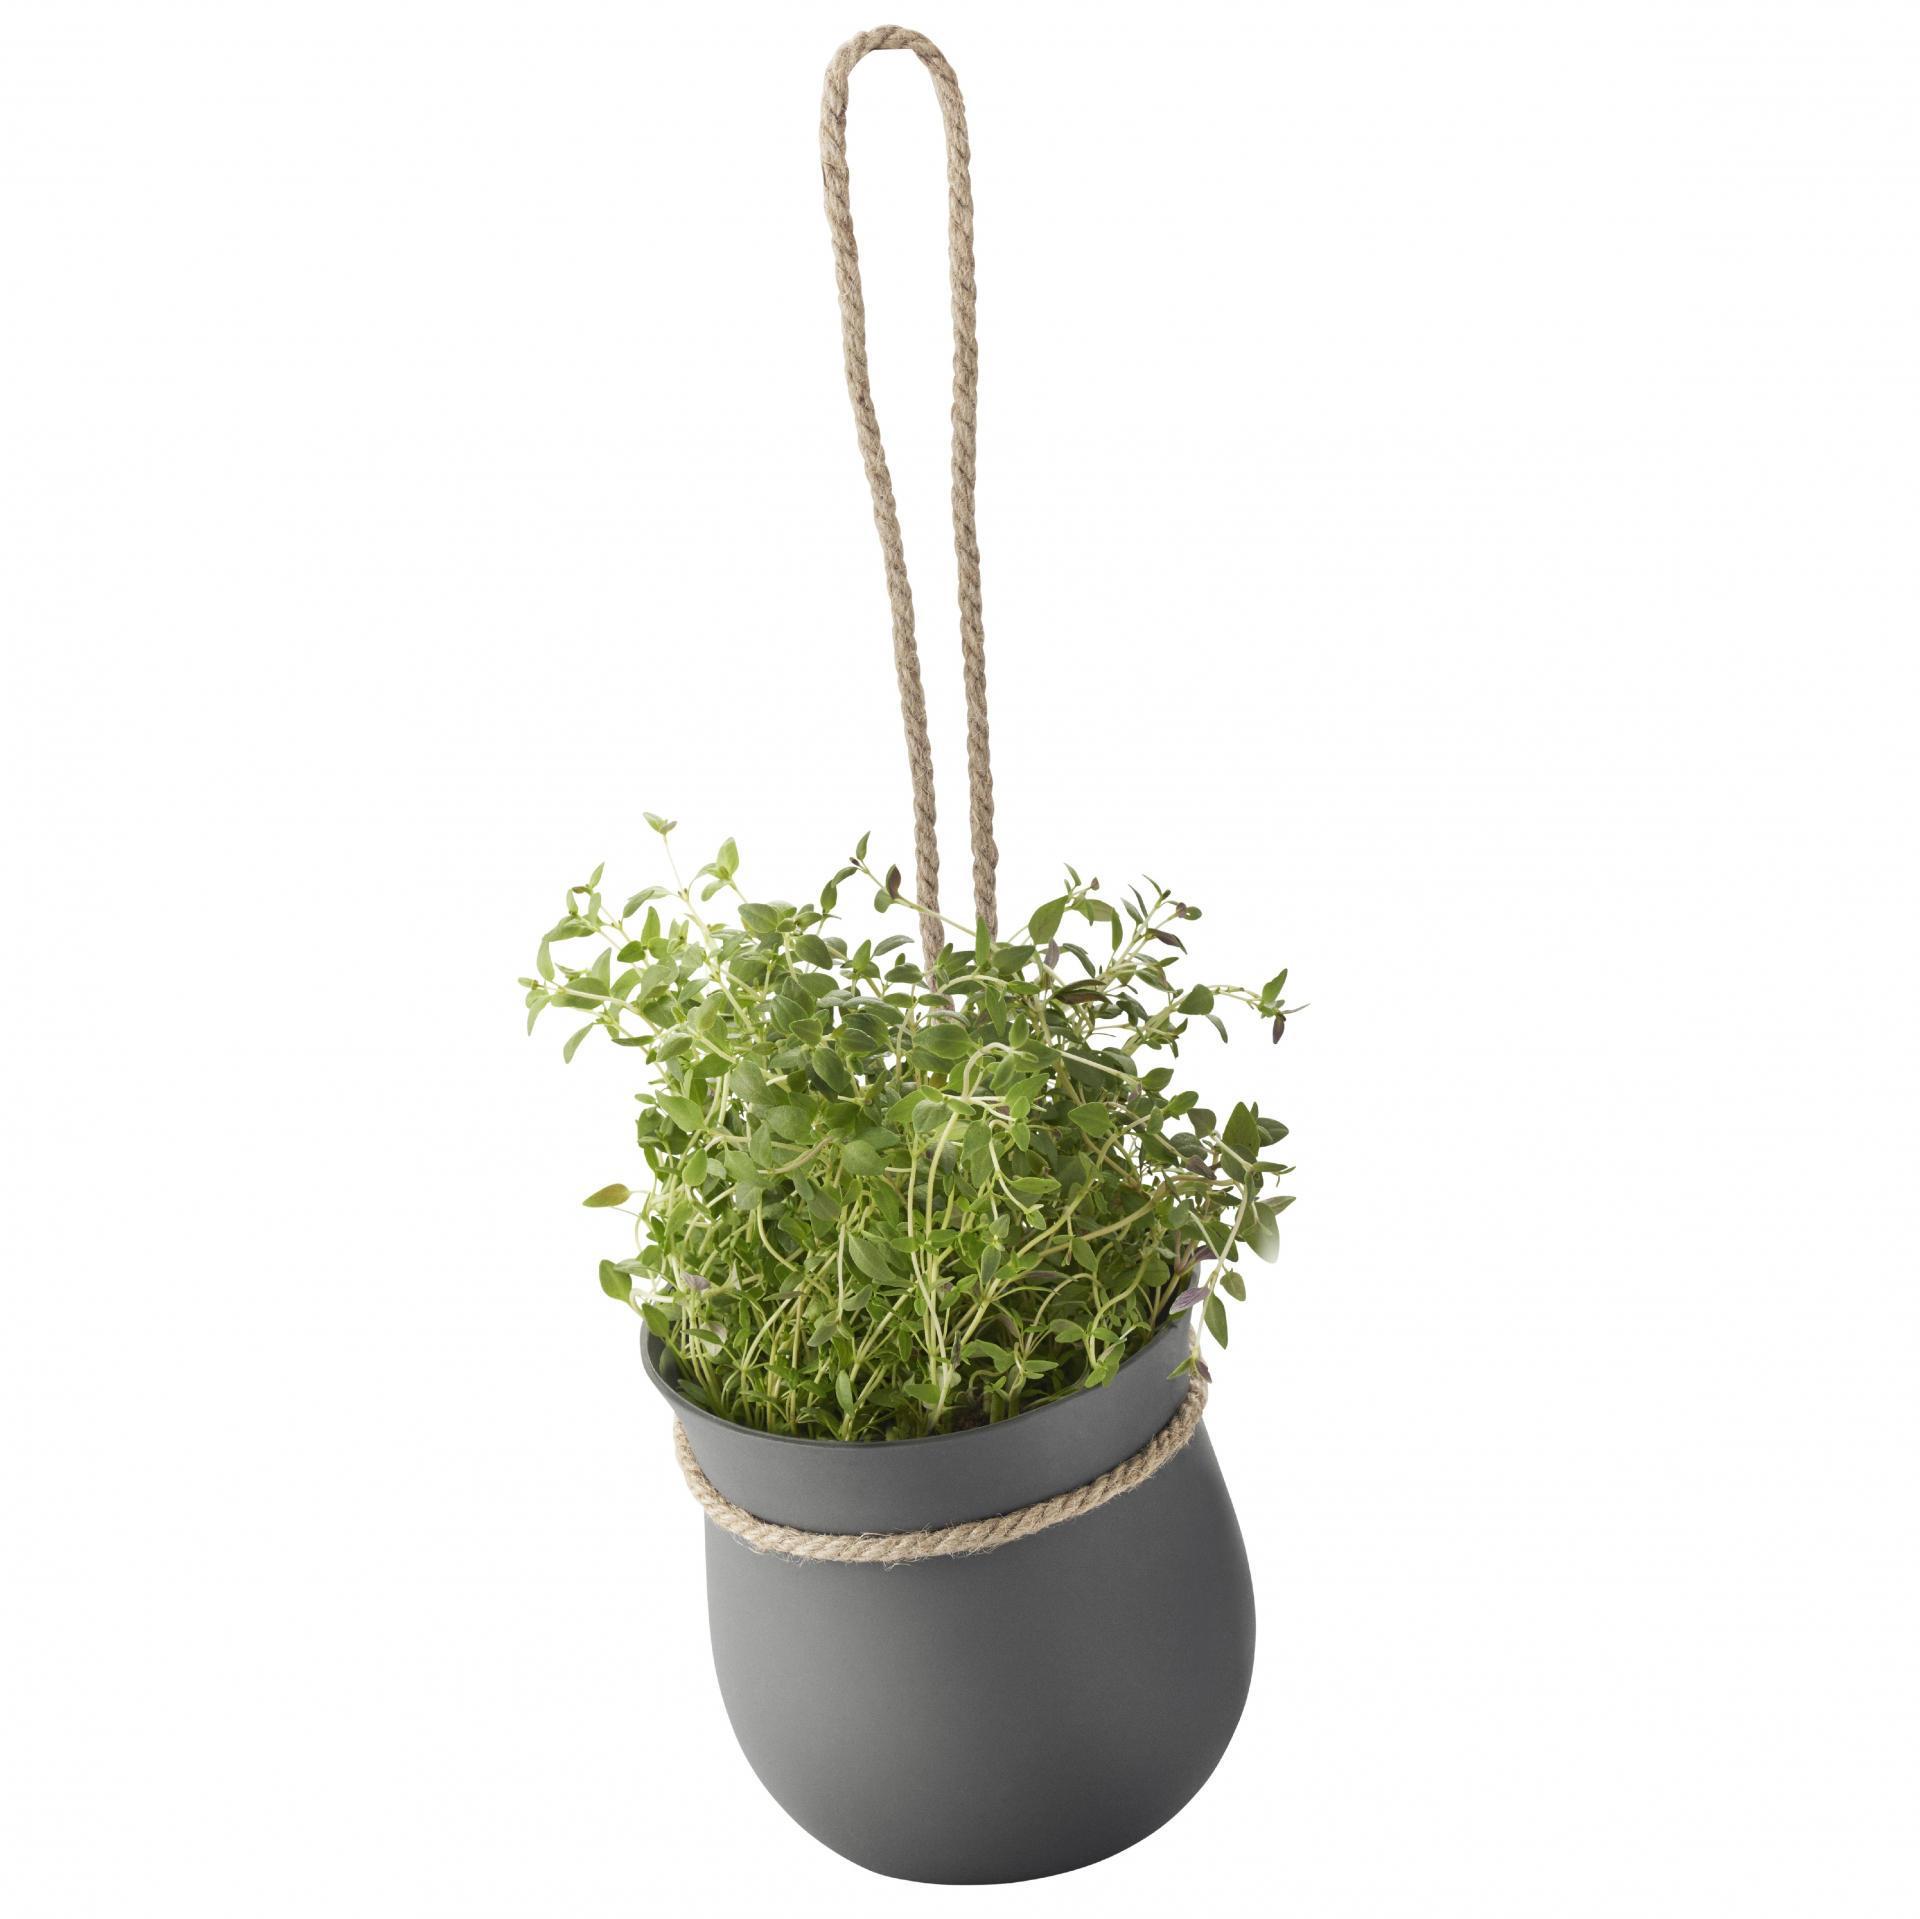 RIG-TIG Závěsný silikonový květináč Grow-it Grey, šedá barva, plast